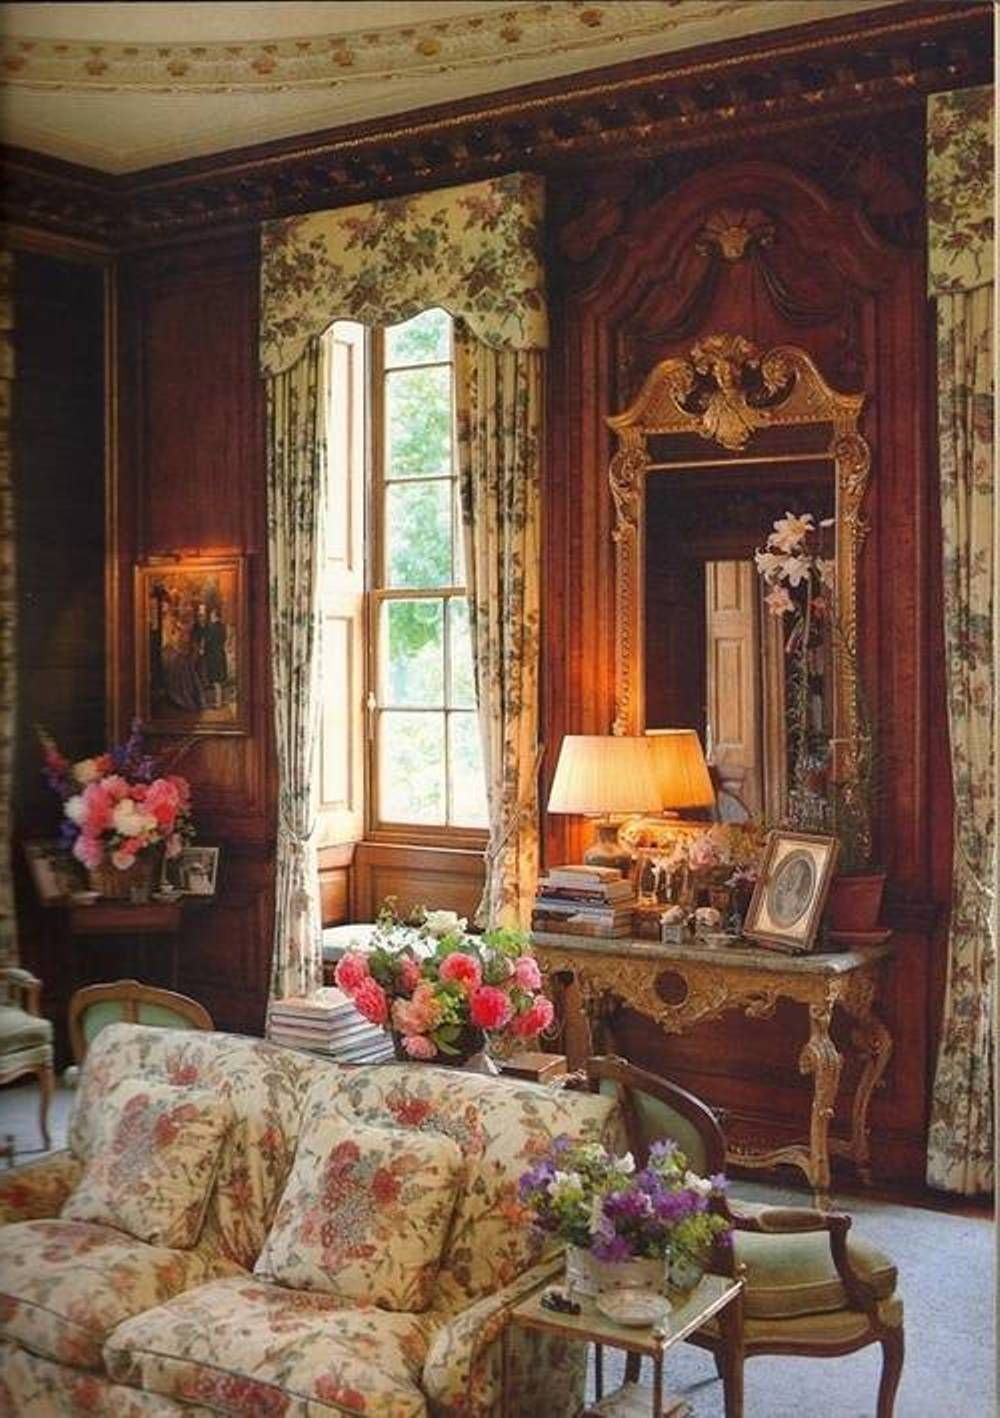 Romantic Homes Decorating: Romantic Victorian House Interior